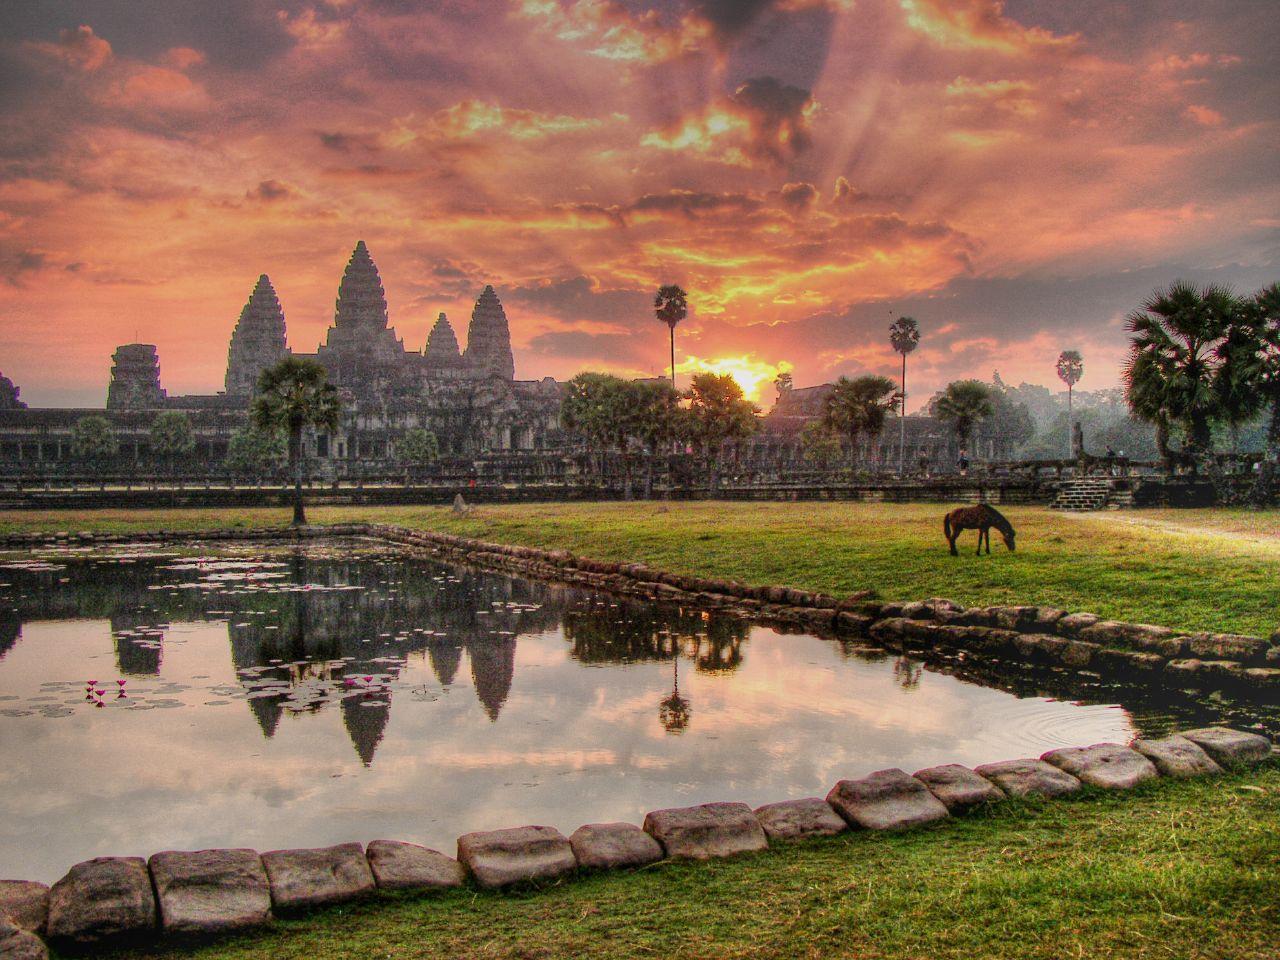 http://2.bp.blogspot.com/-PqDenk1uRS8/T3Vw8B_wl7I/AAAAAAAAE1E/PAWisAU6z30/s1600/angkor-wat-temple-2.jpg